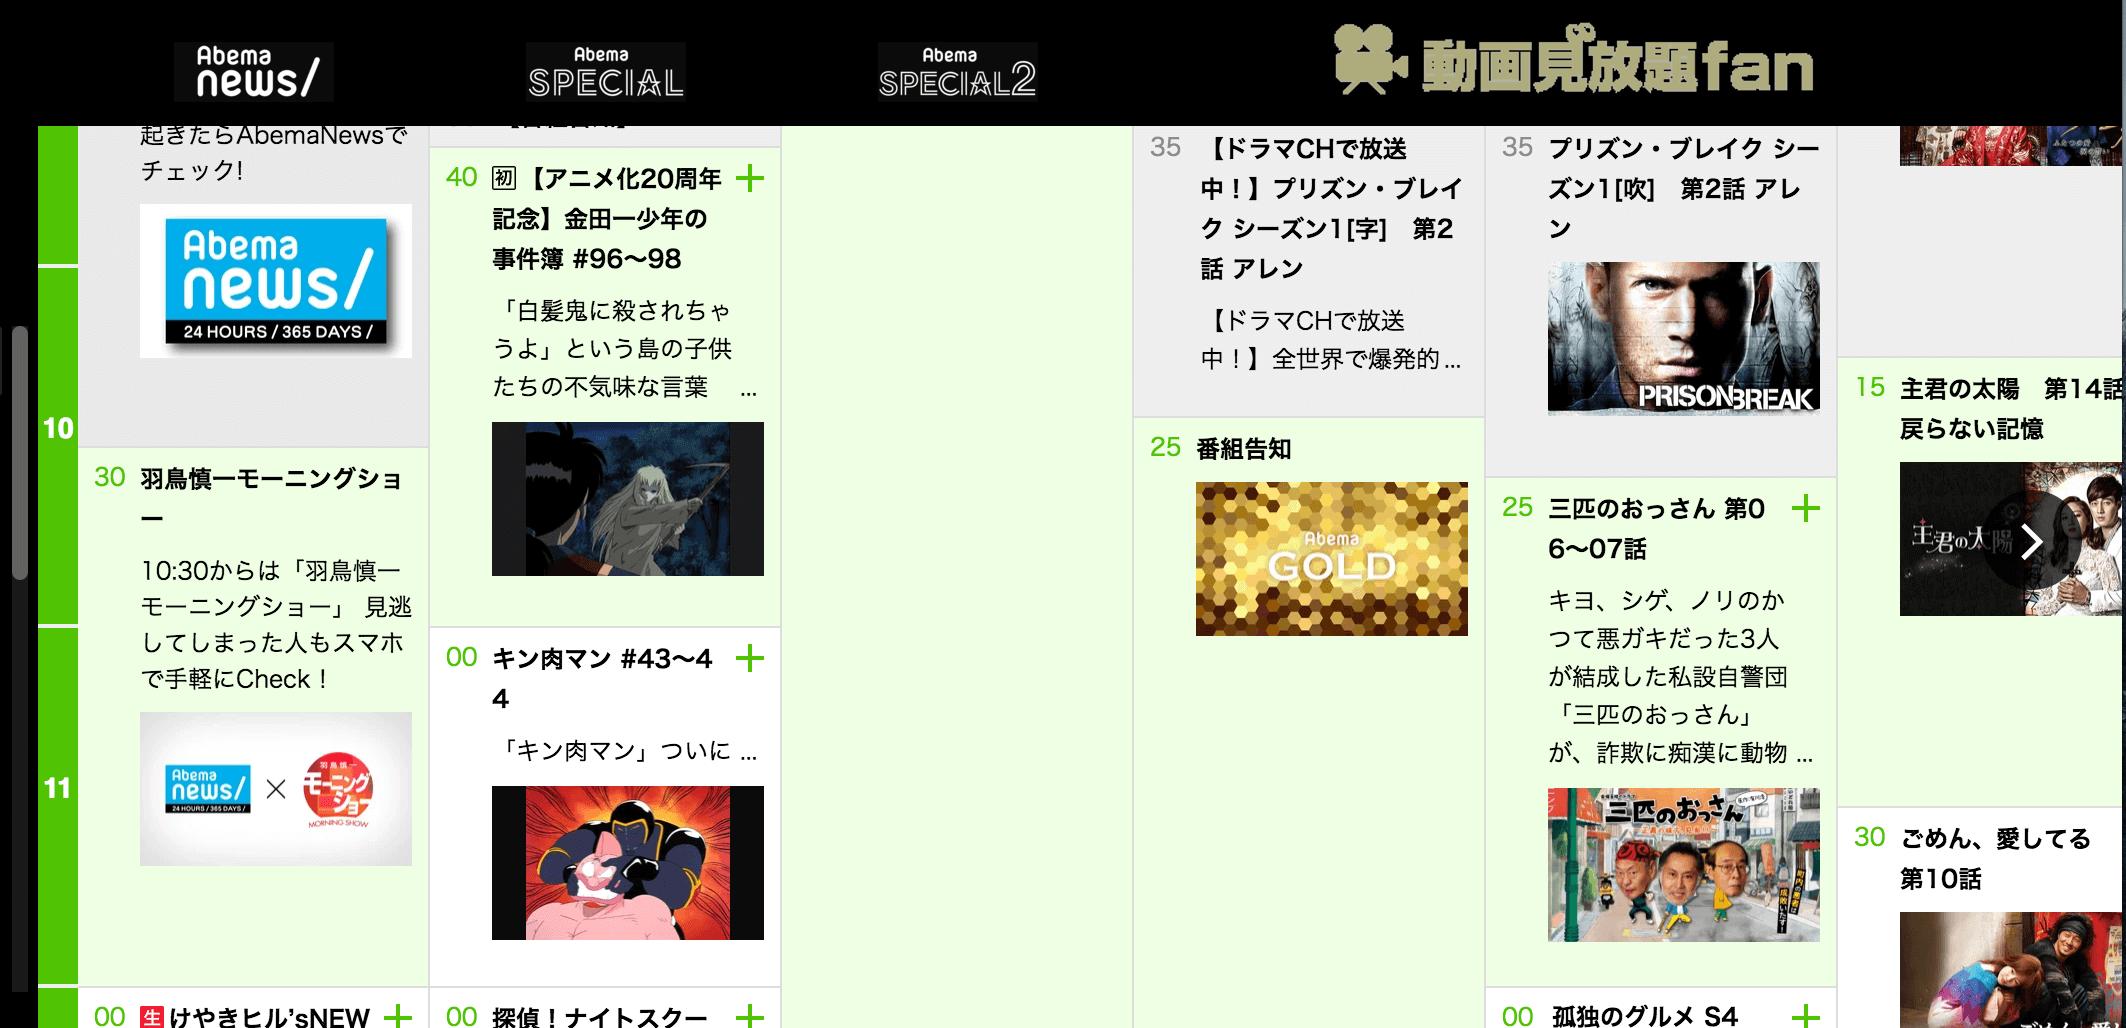 AbemaTVアプリ